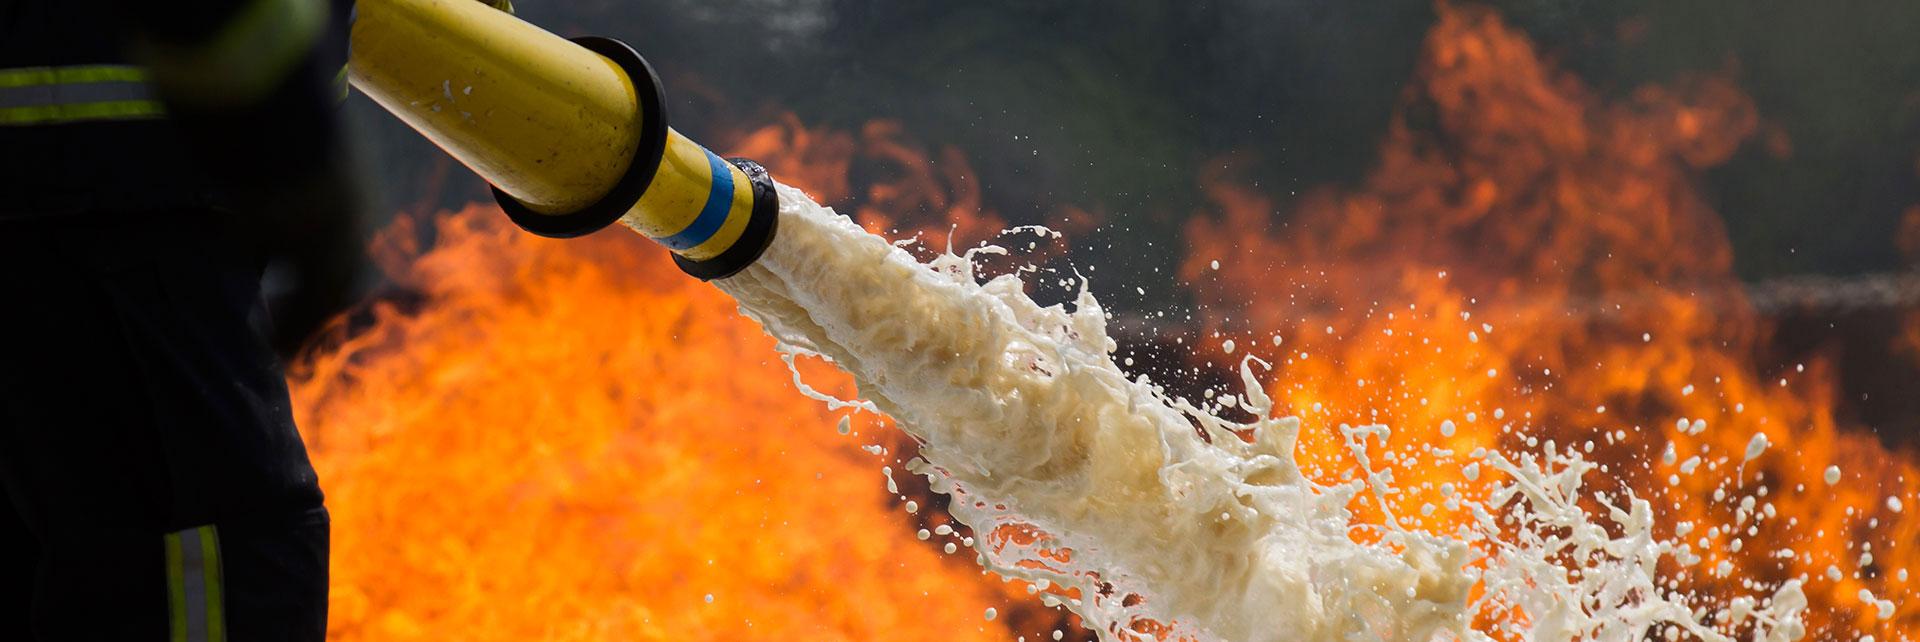 Fire Foam Newrita